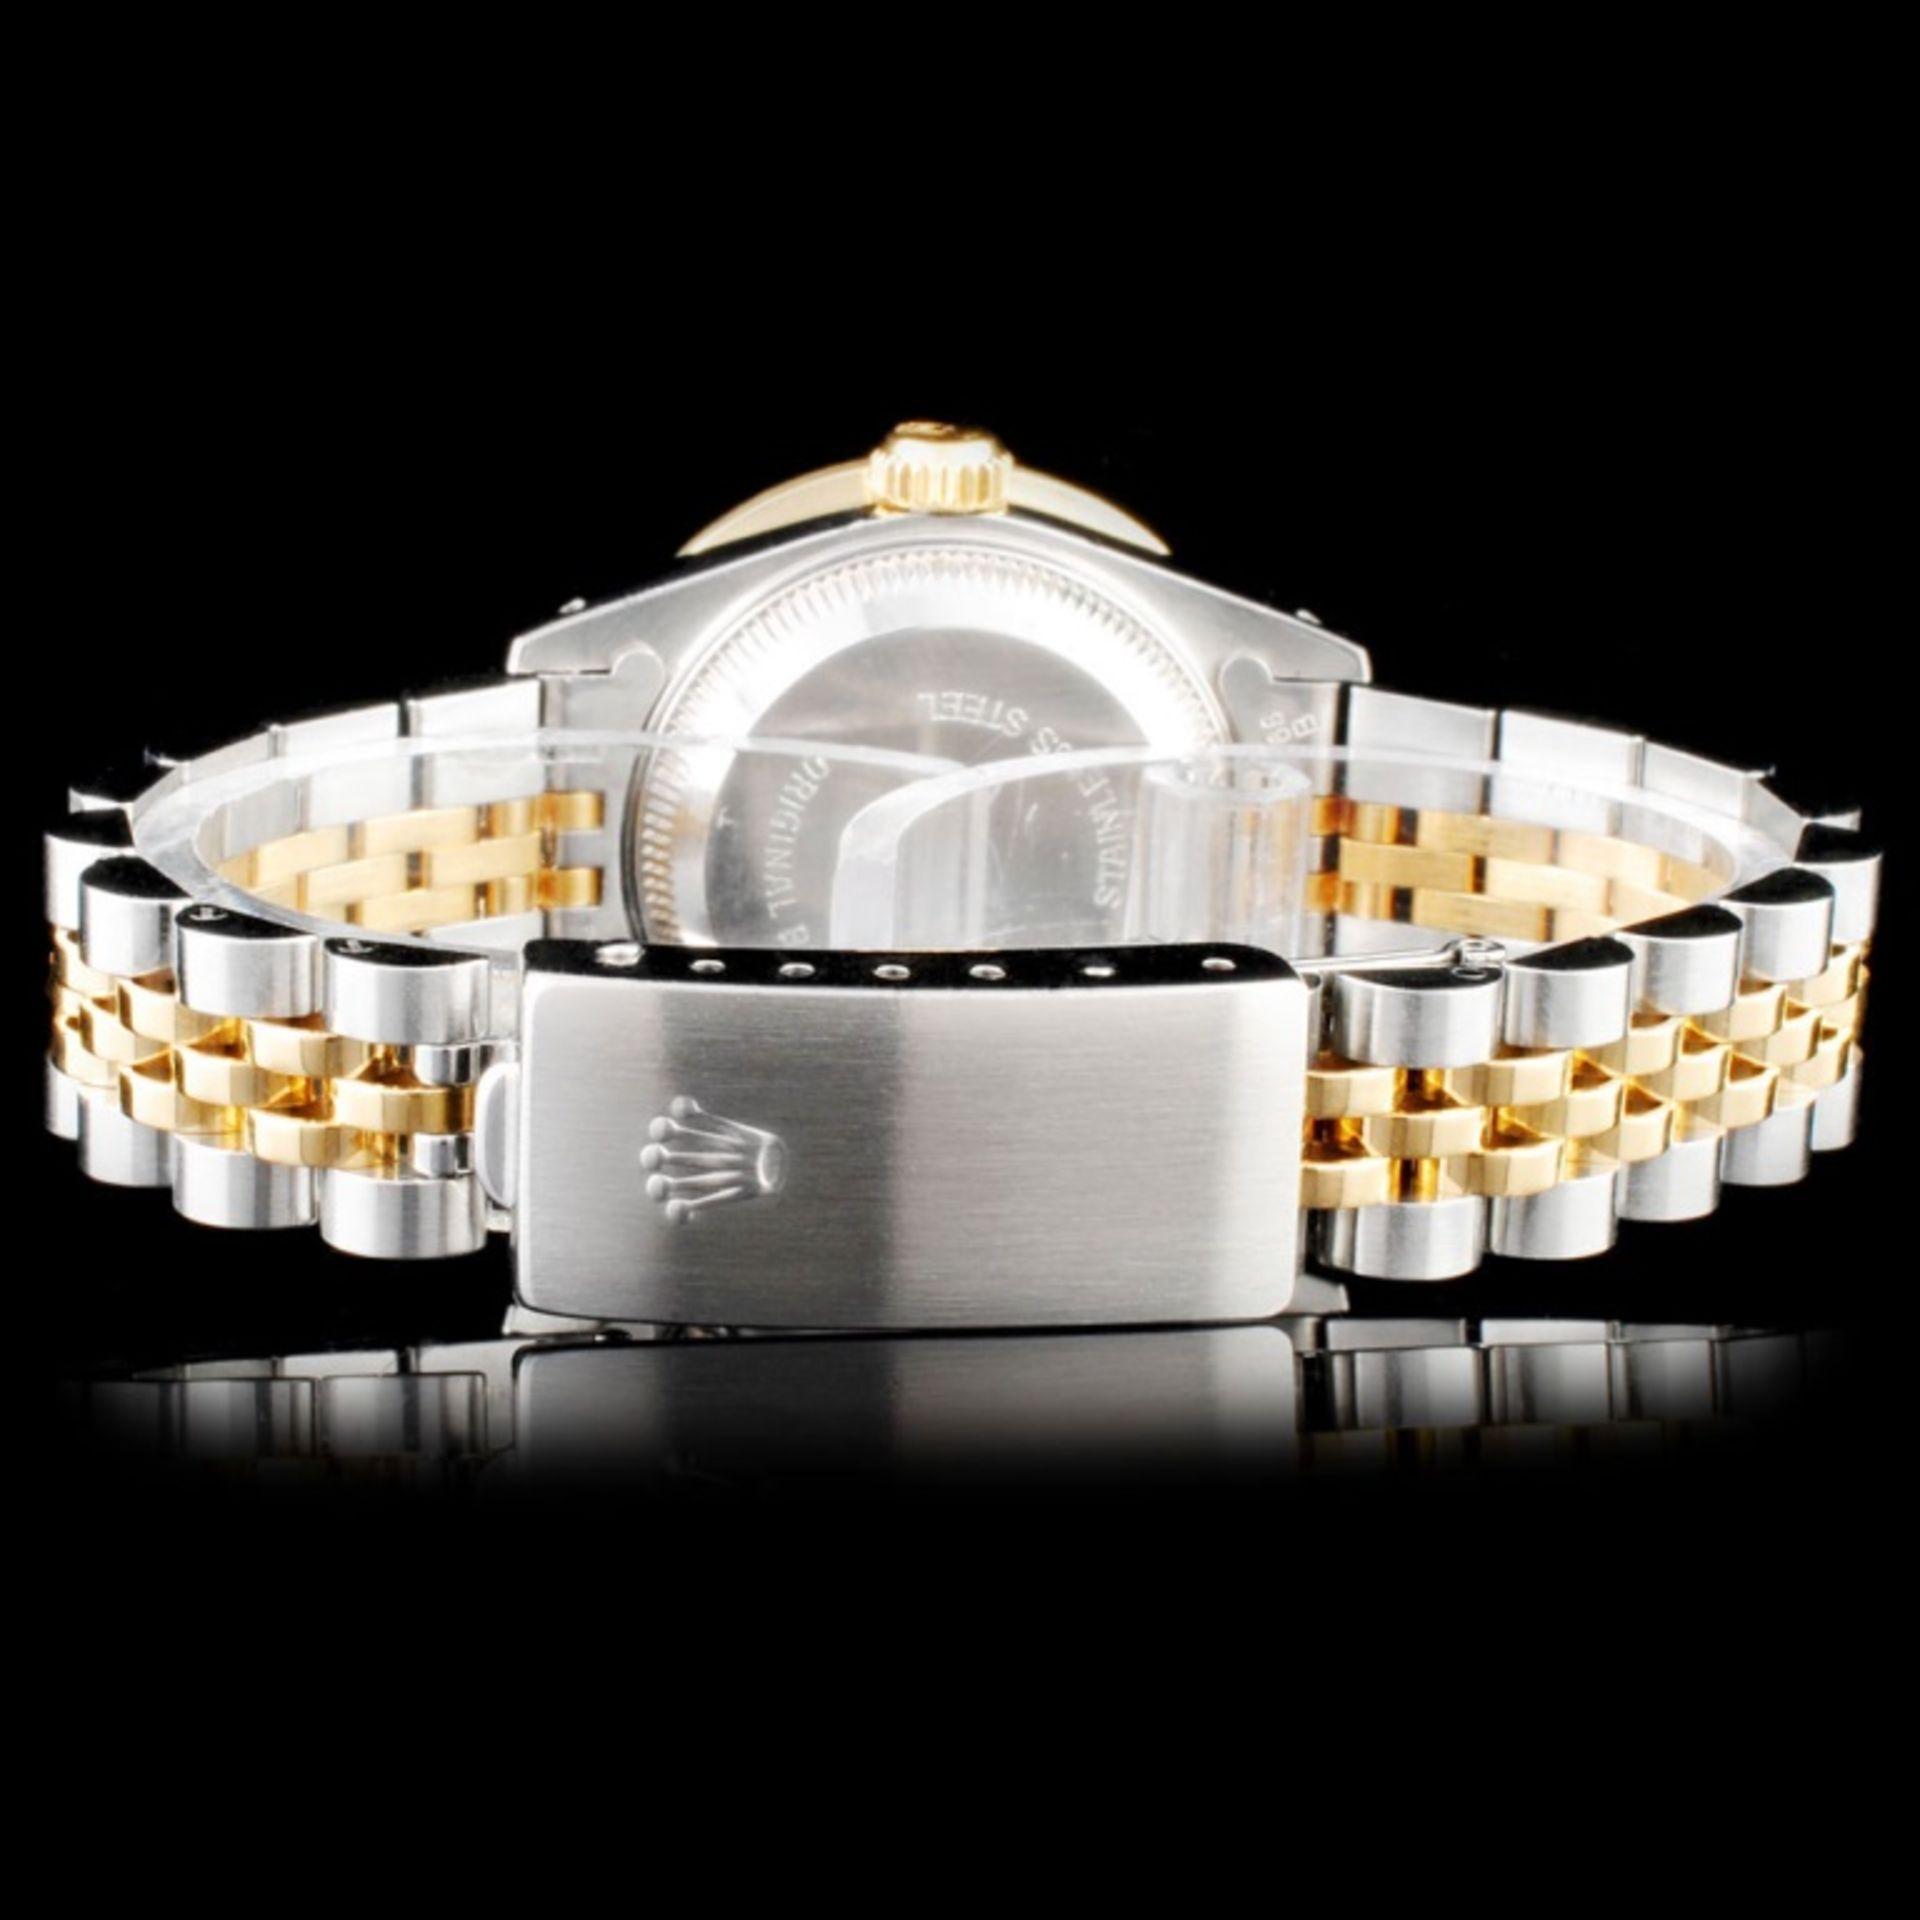 Rolex DateJust Ladies Diamond Wristwatch - Image 3 of 5